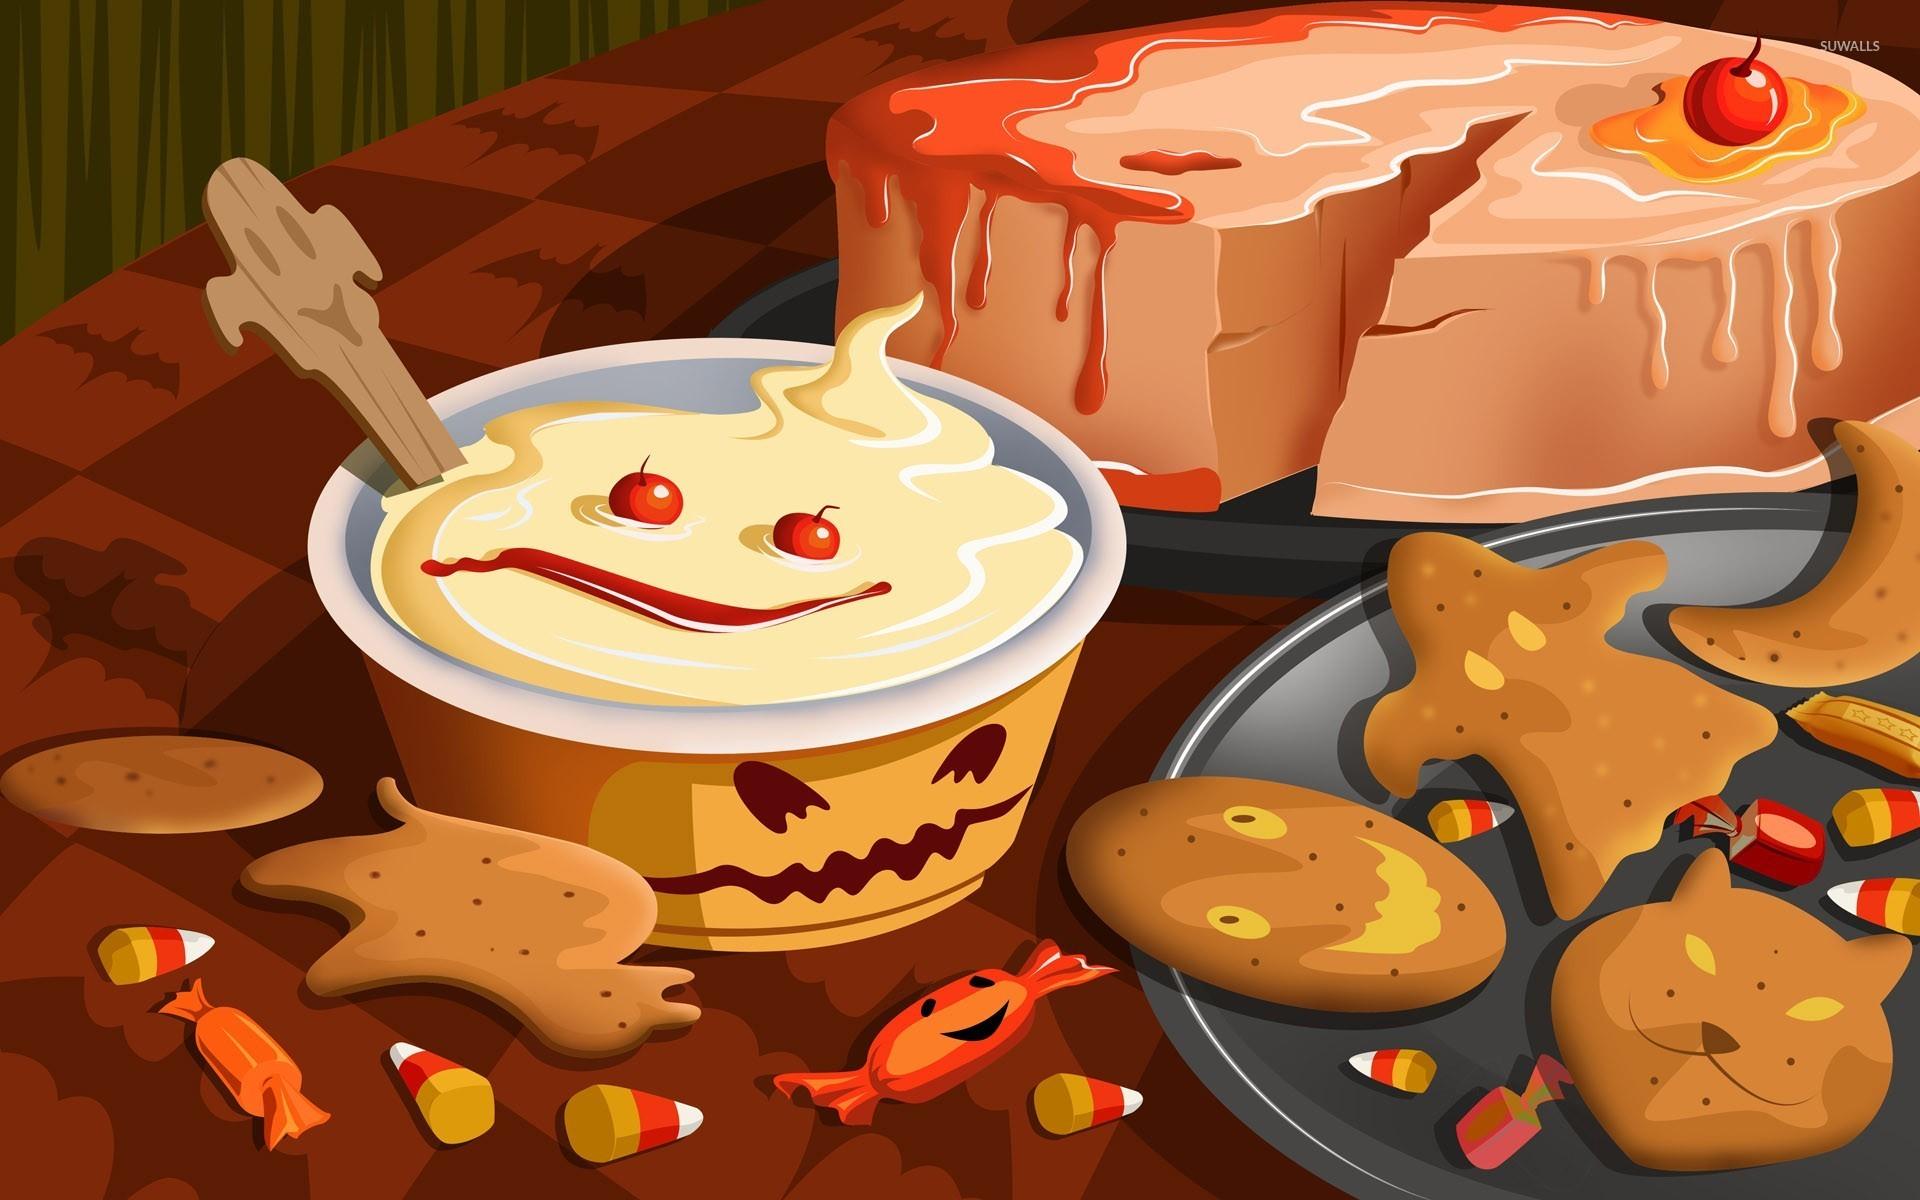 Halloween desserts wallpaper - Holiday wallpapers - #23402